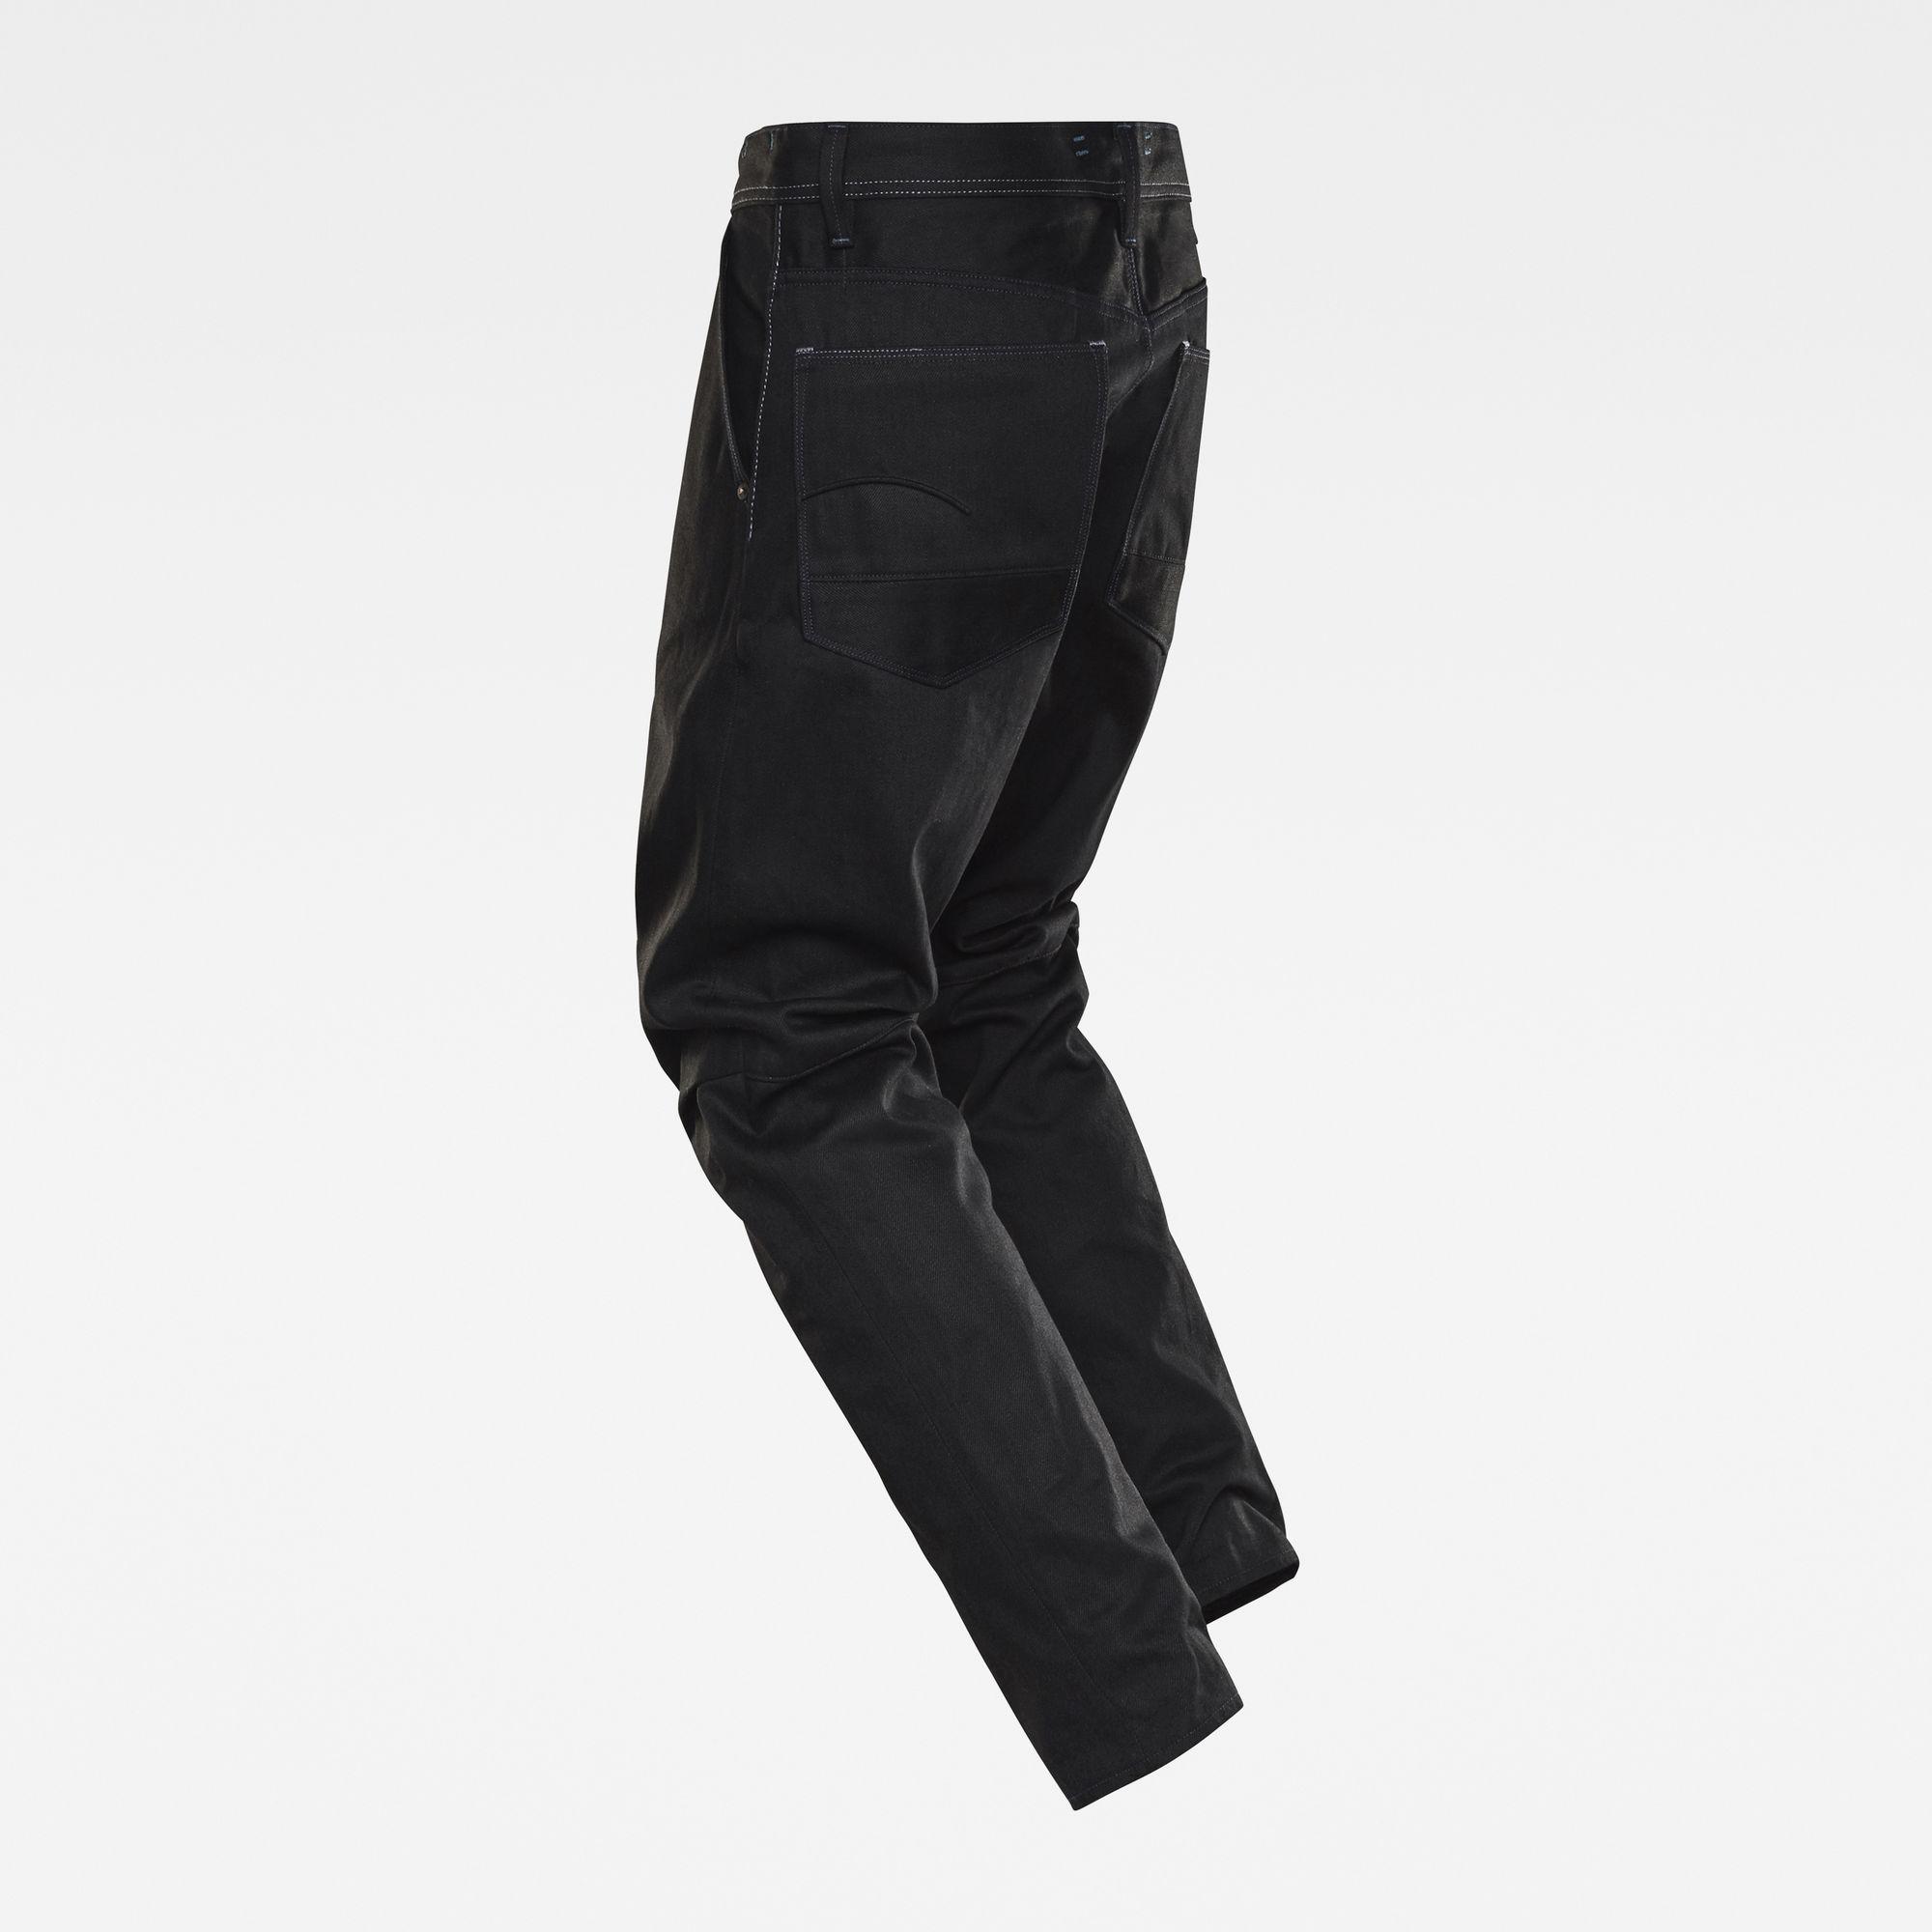 G-Star RAW Heren GSRR Grip 3D Relaxed Tapered Selvedge Jeans Zwart